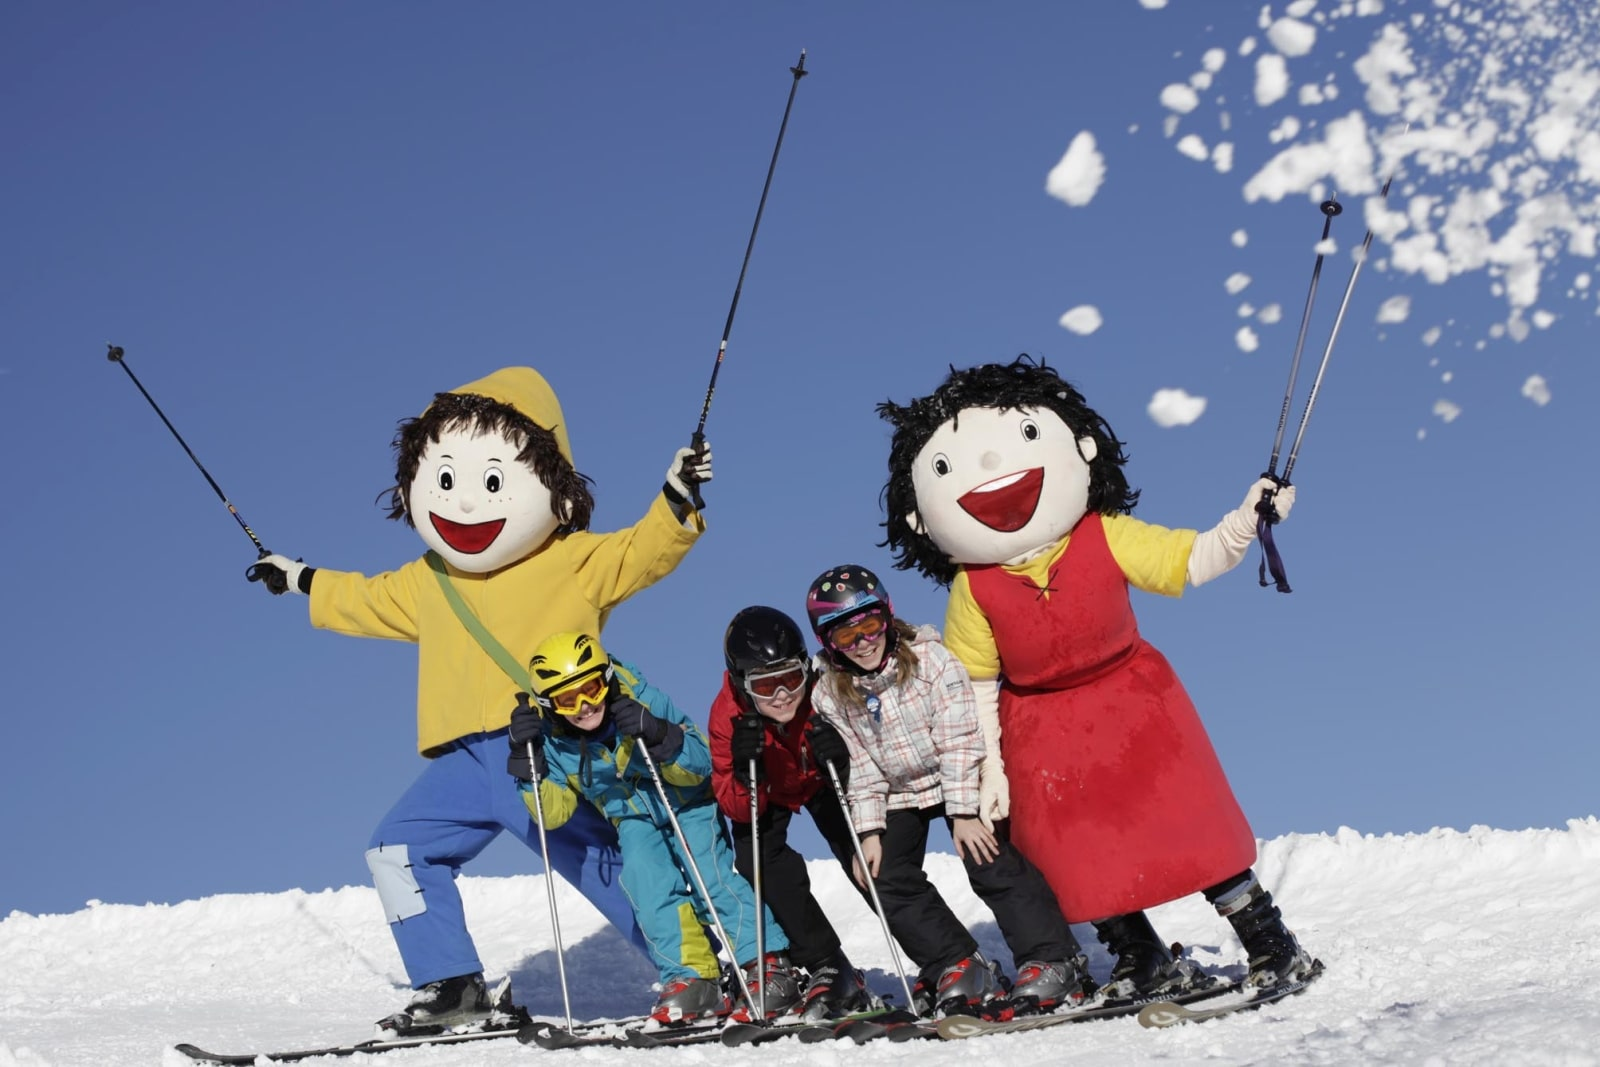 Heidi-Chalet-Falkert-Heidialm-Falkertsee-Ski-Nockberge-Piste-Kinder-Skischule